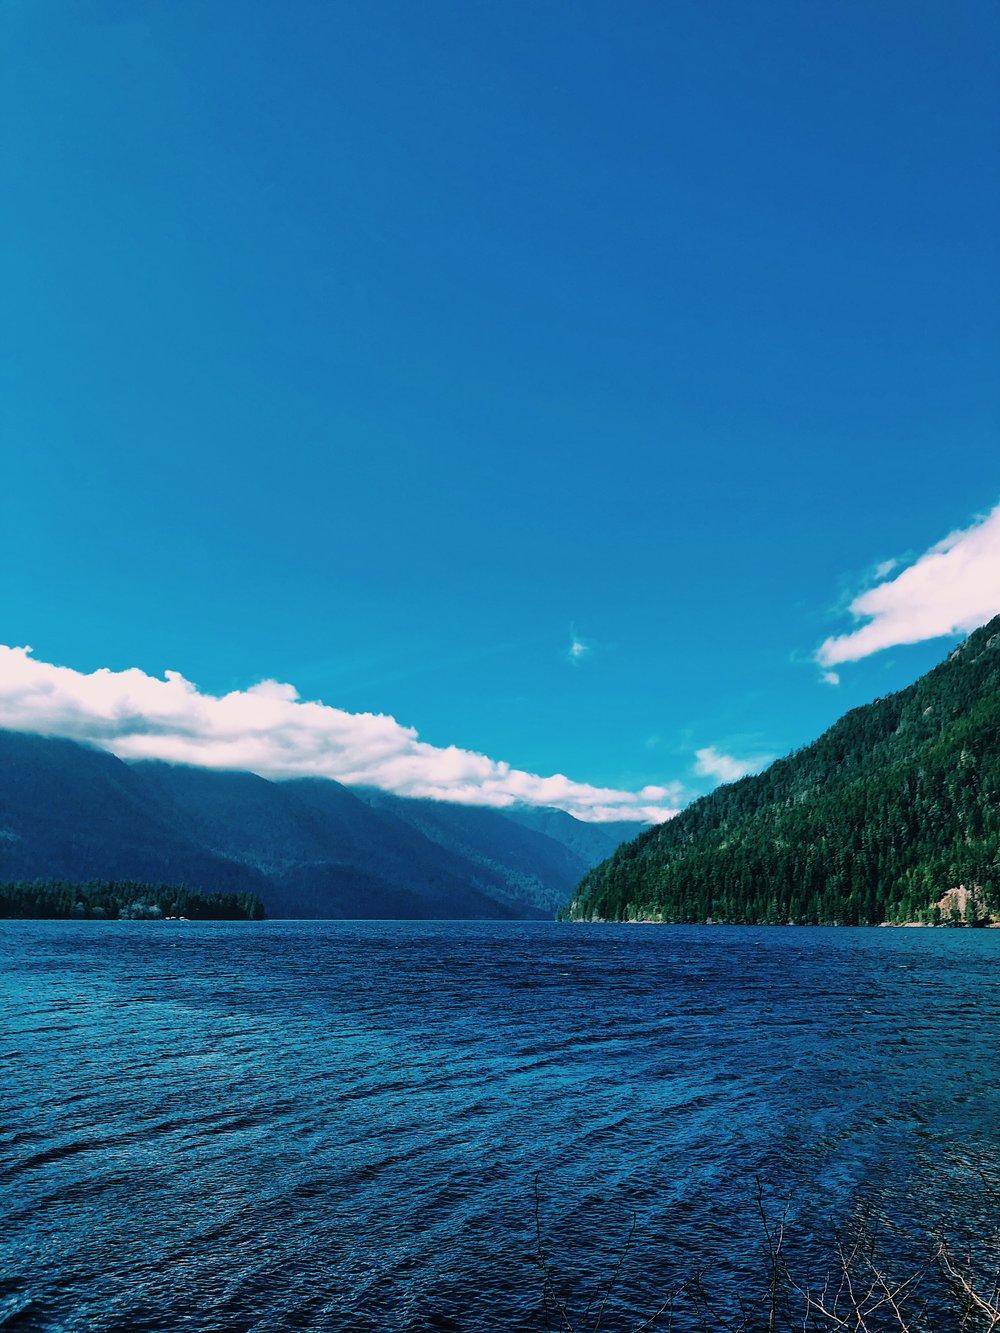 Lake Cresent, Washington